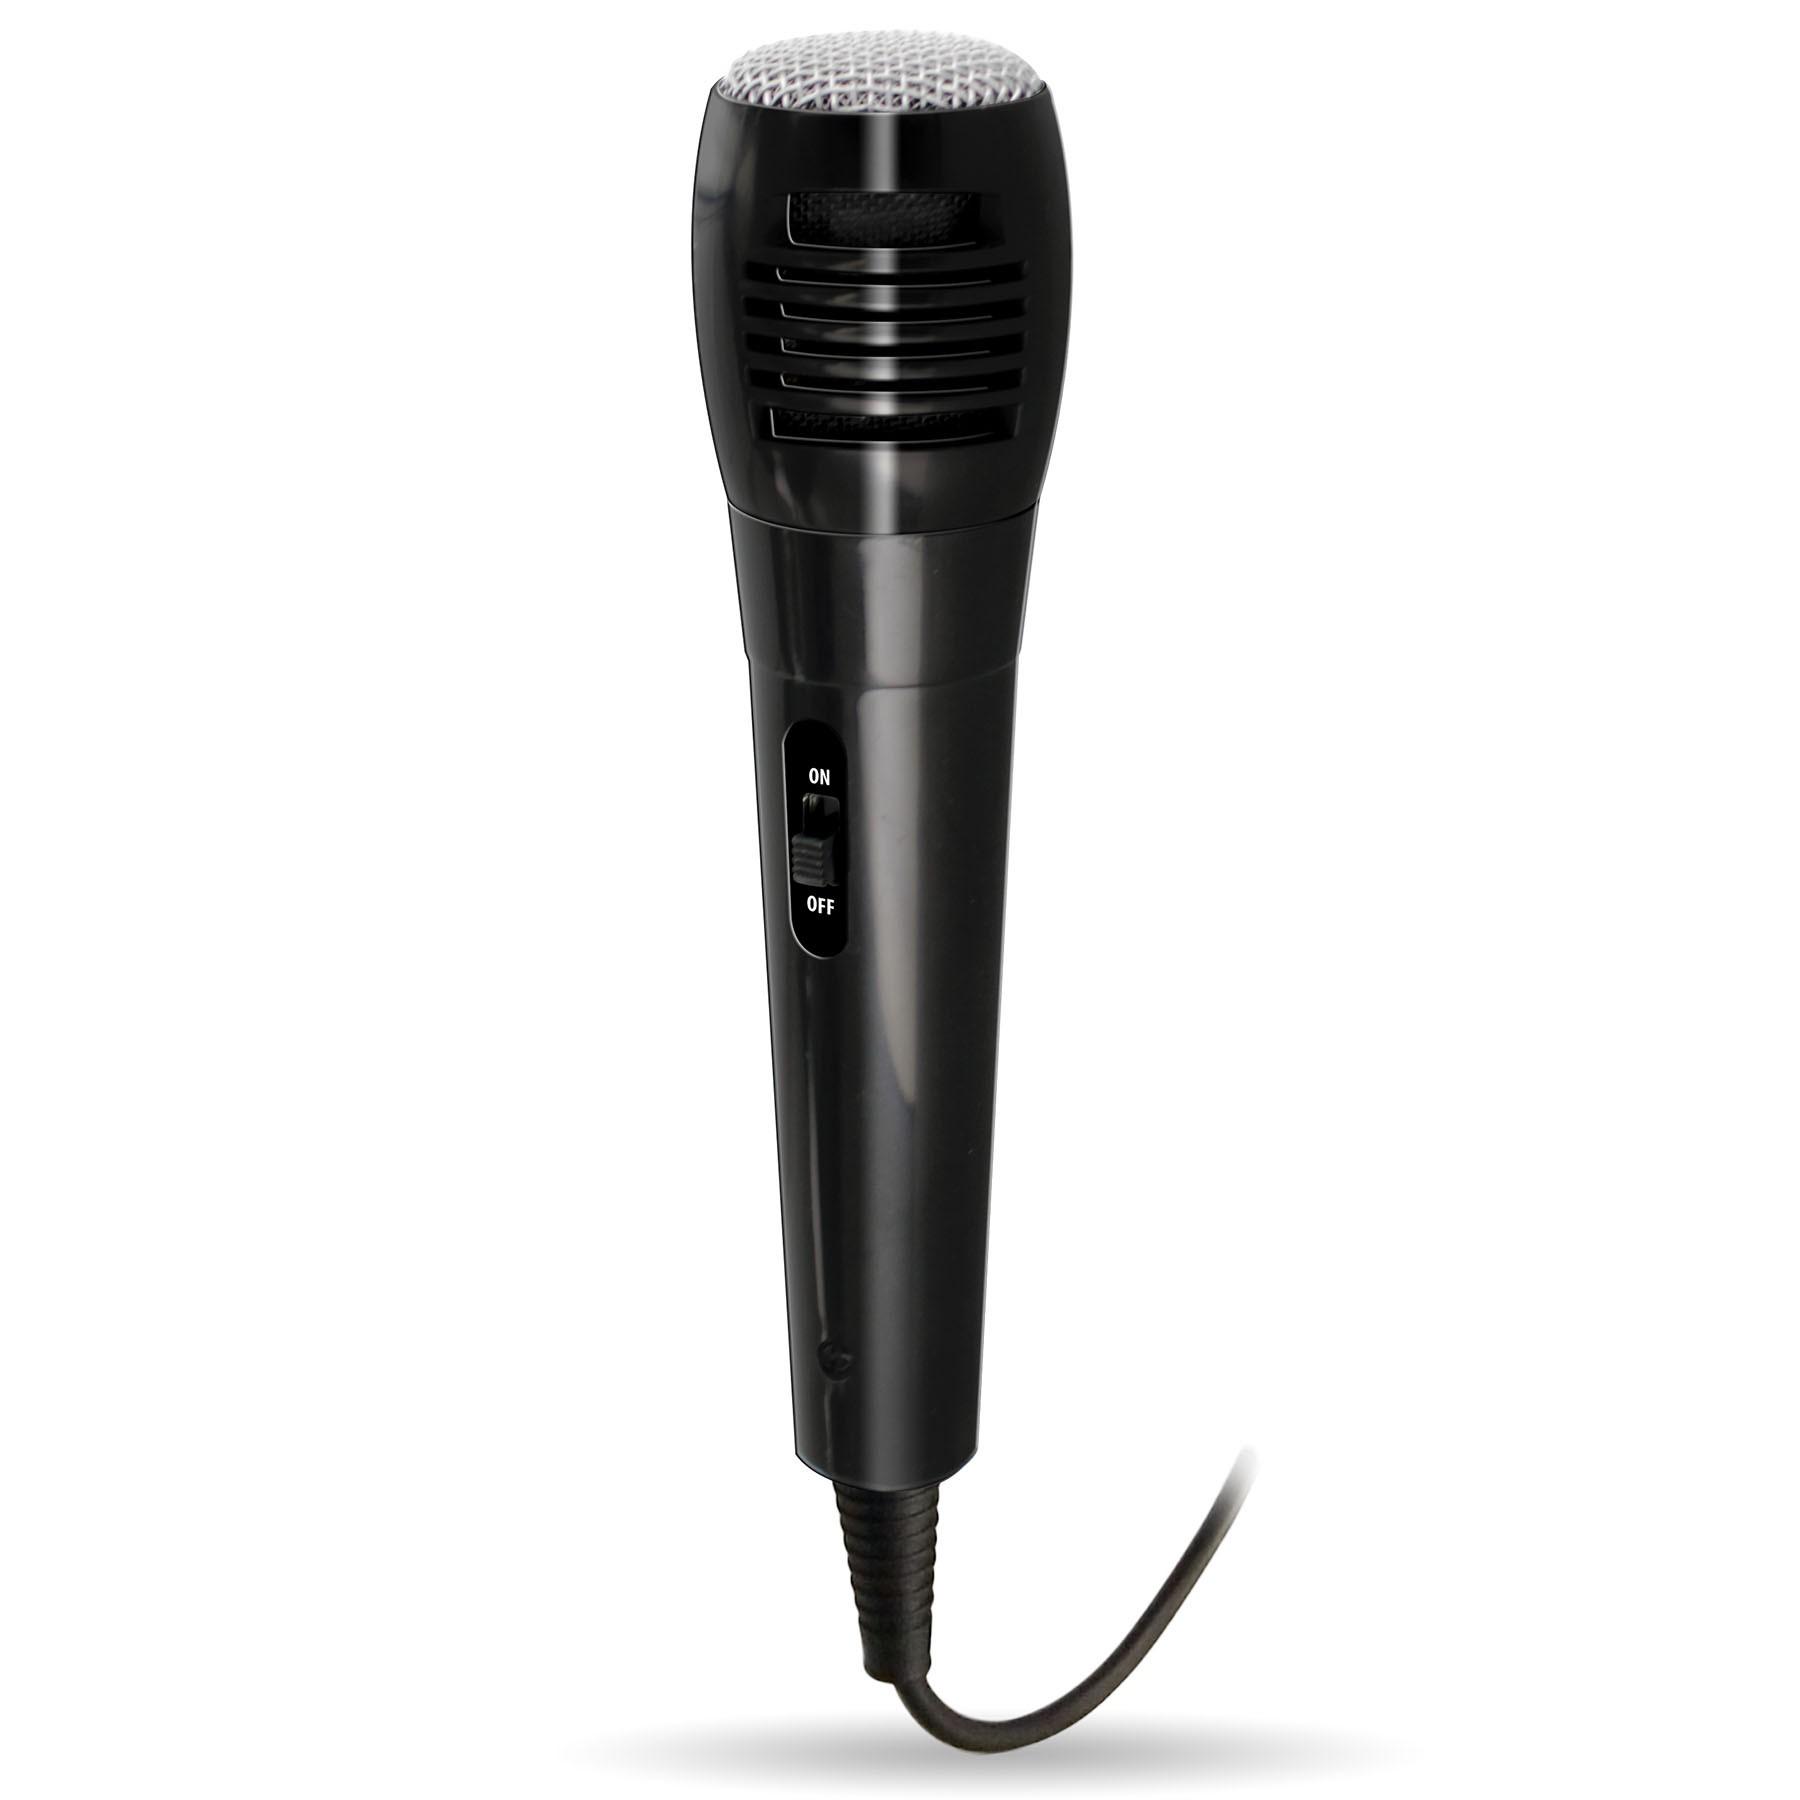 Professional Dynamic Karaoke Microphone